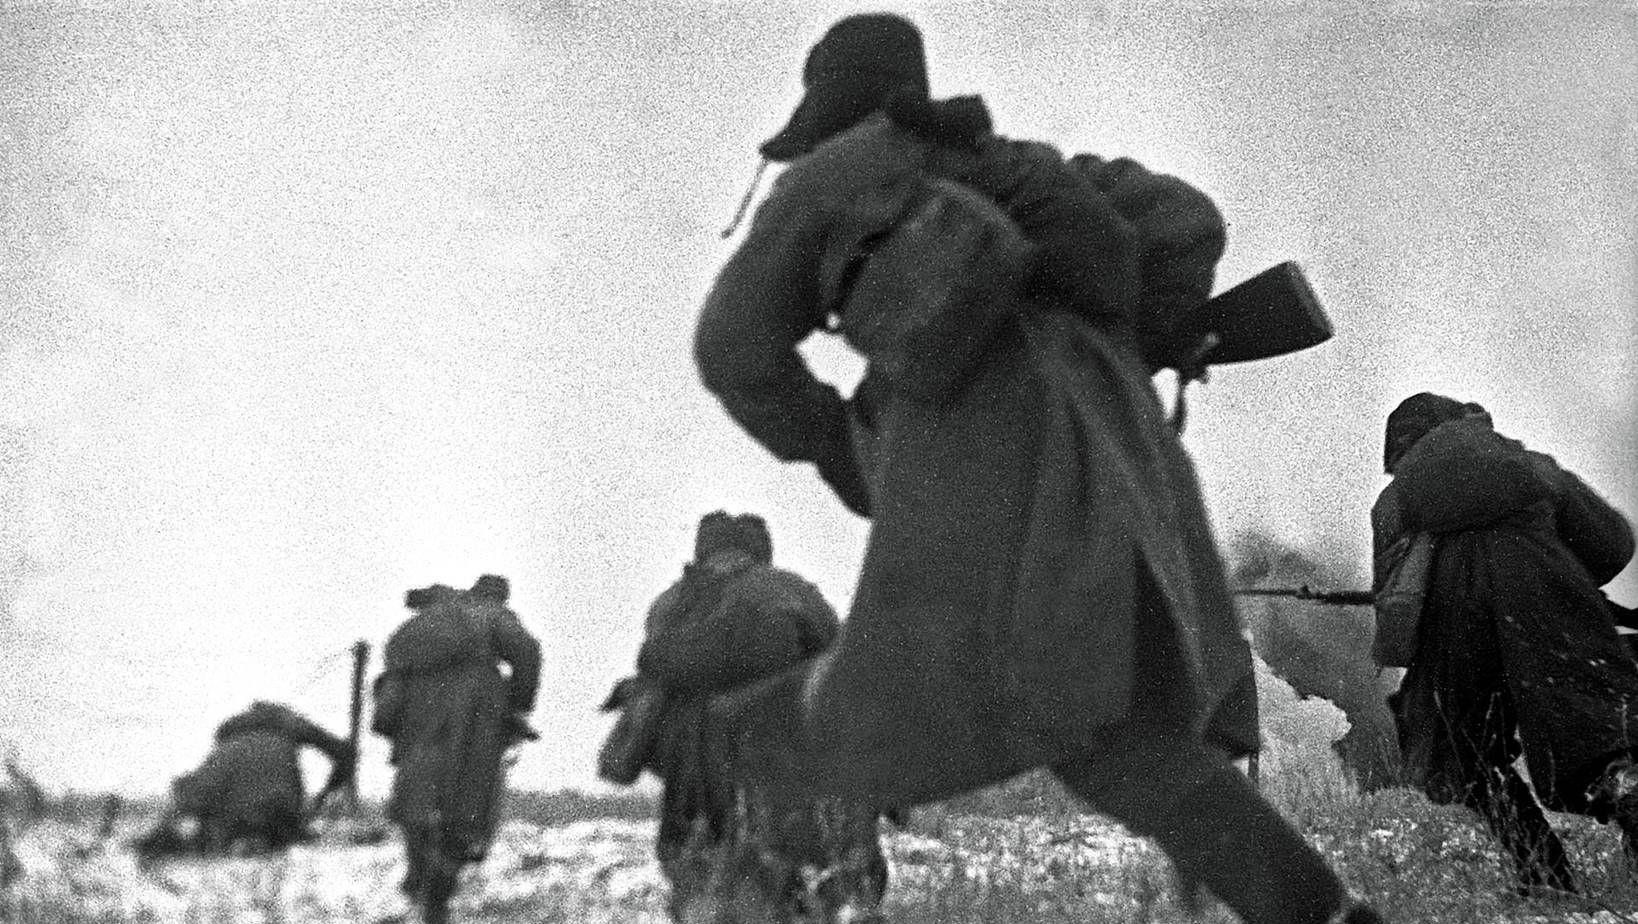 Наталья Боде. Красноармейцы идут в атаку на врага под Сталинградом. 1942